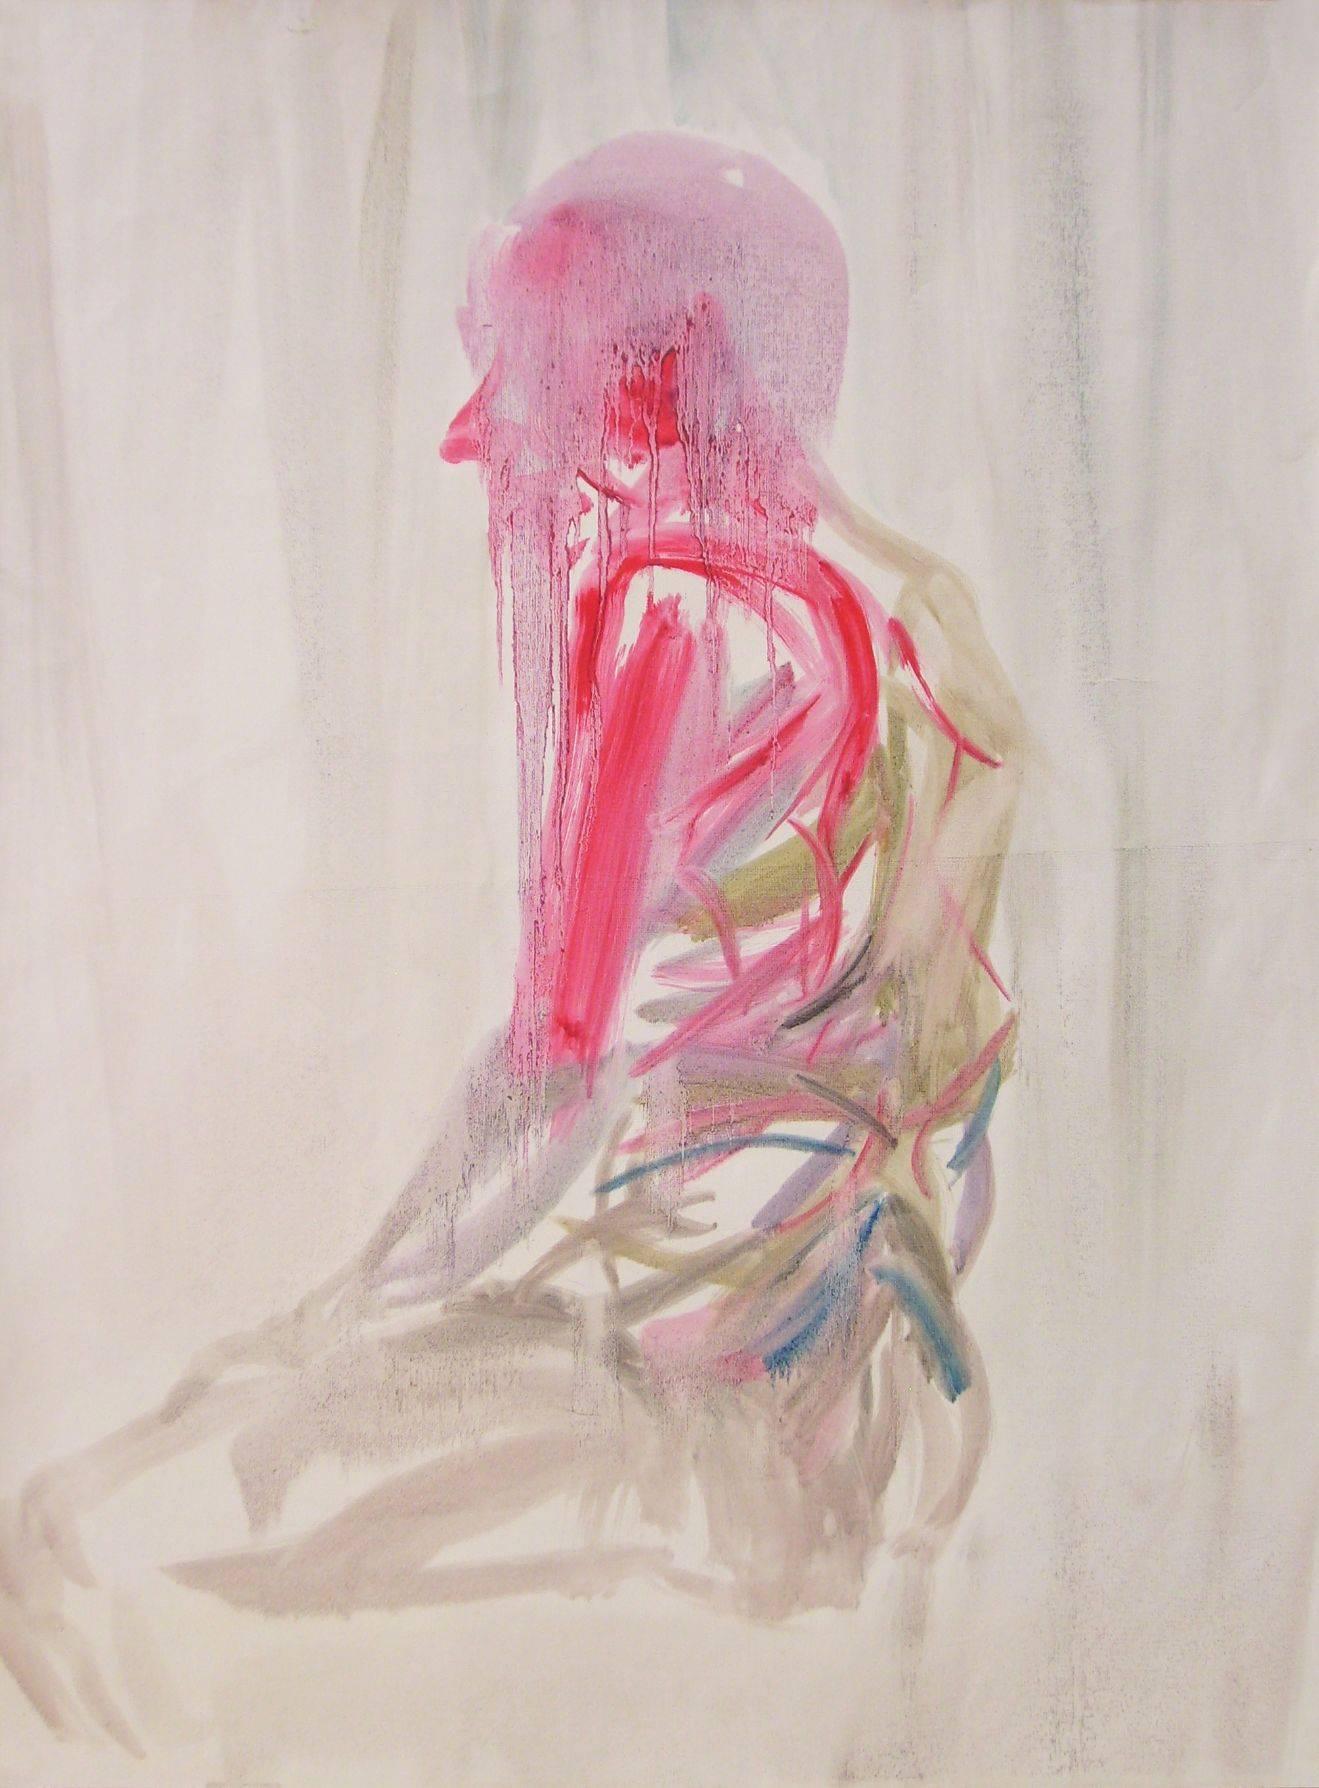 Study for Portrait of Vantana No. 4